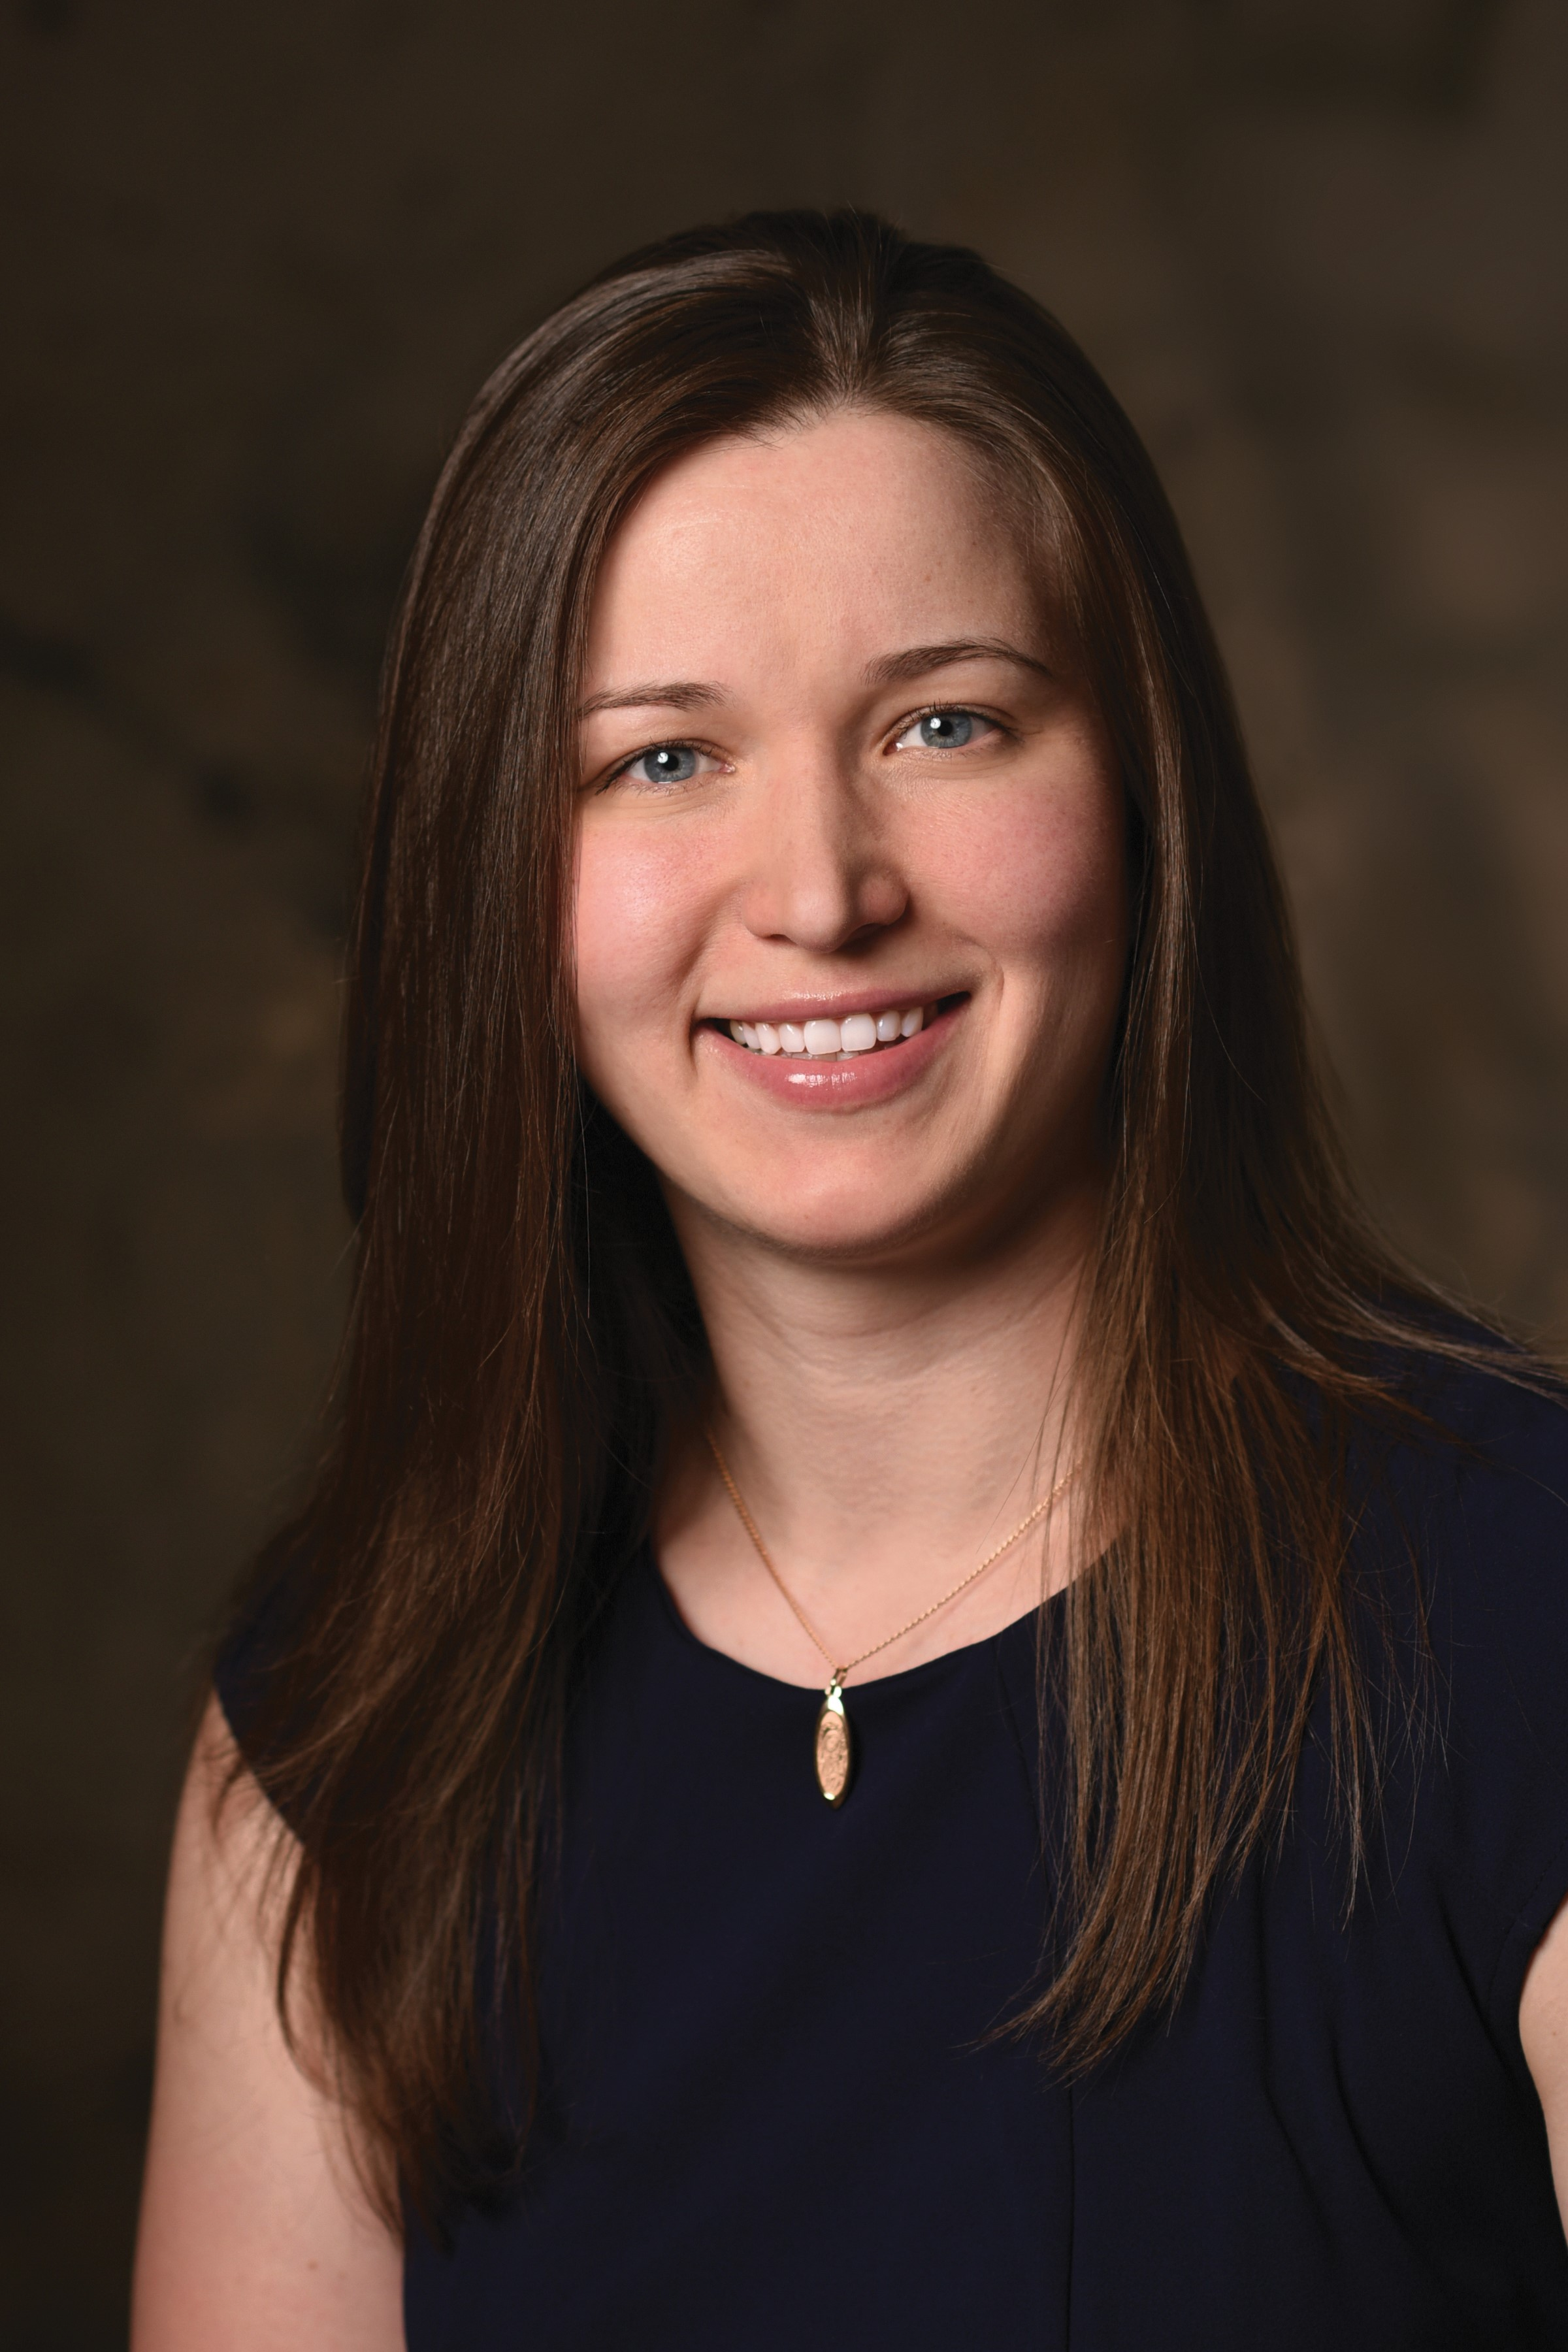 Katya Frantskevich. Photo courtesy of Madison Medical Affiliates.